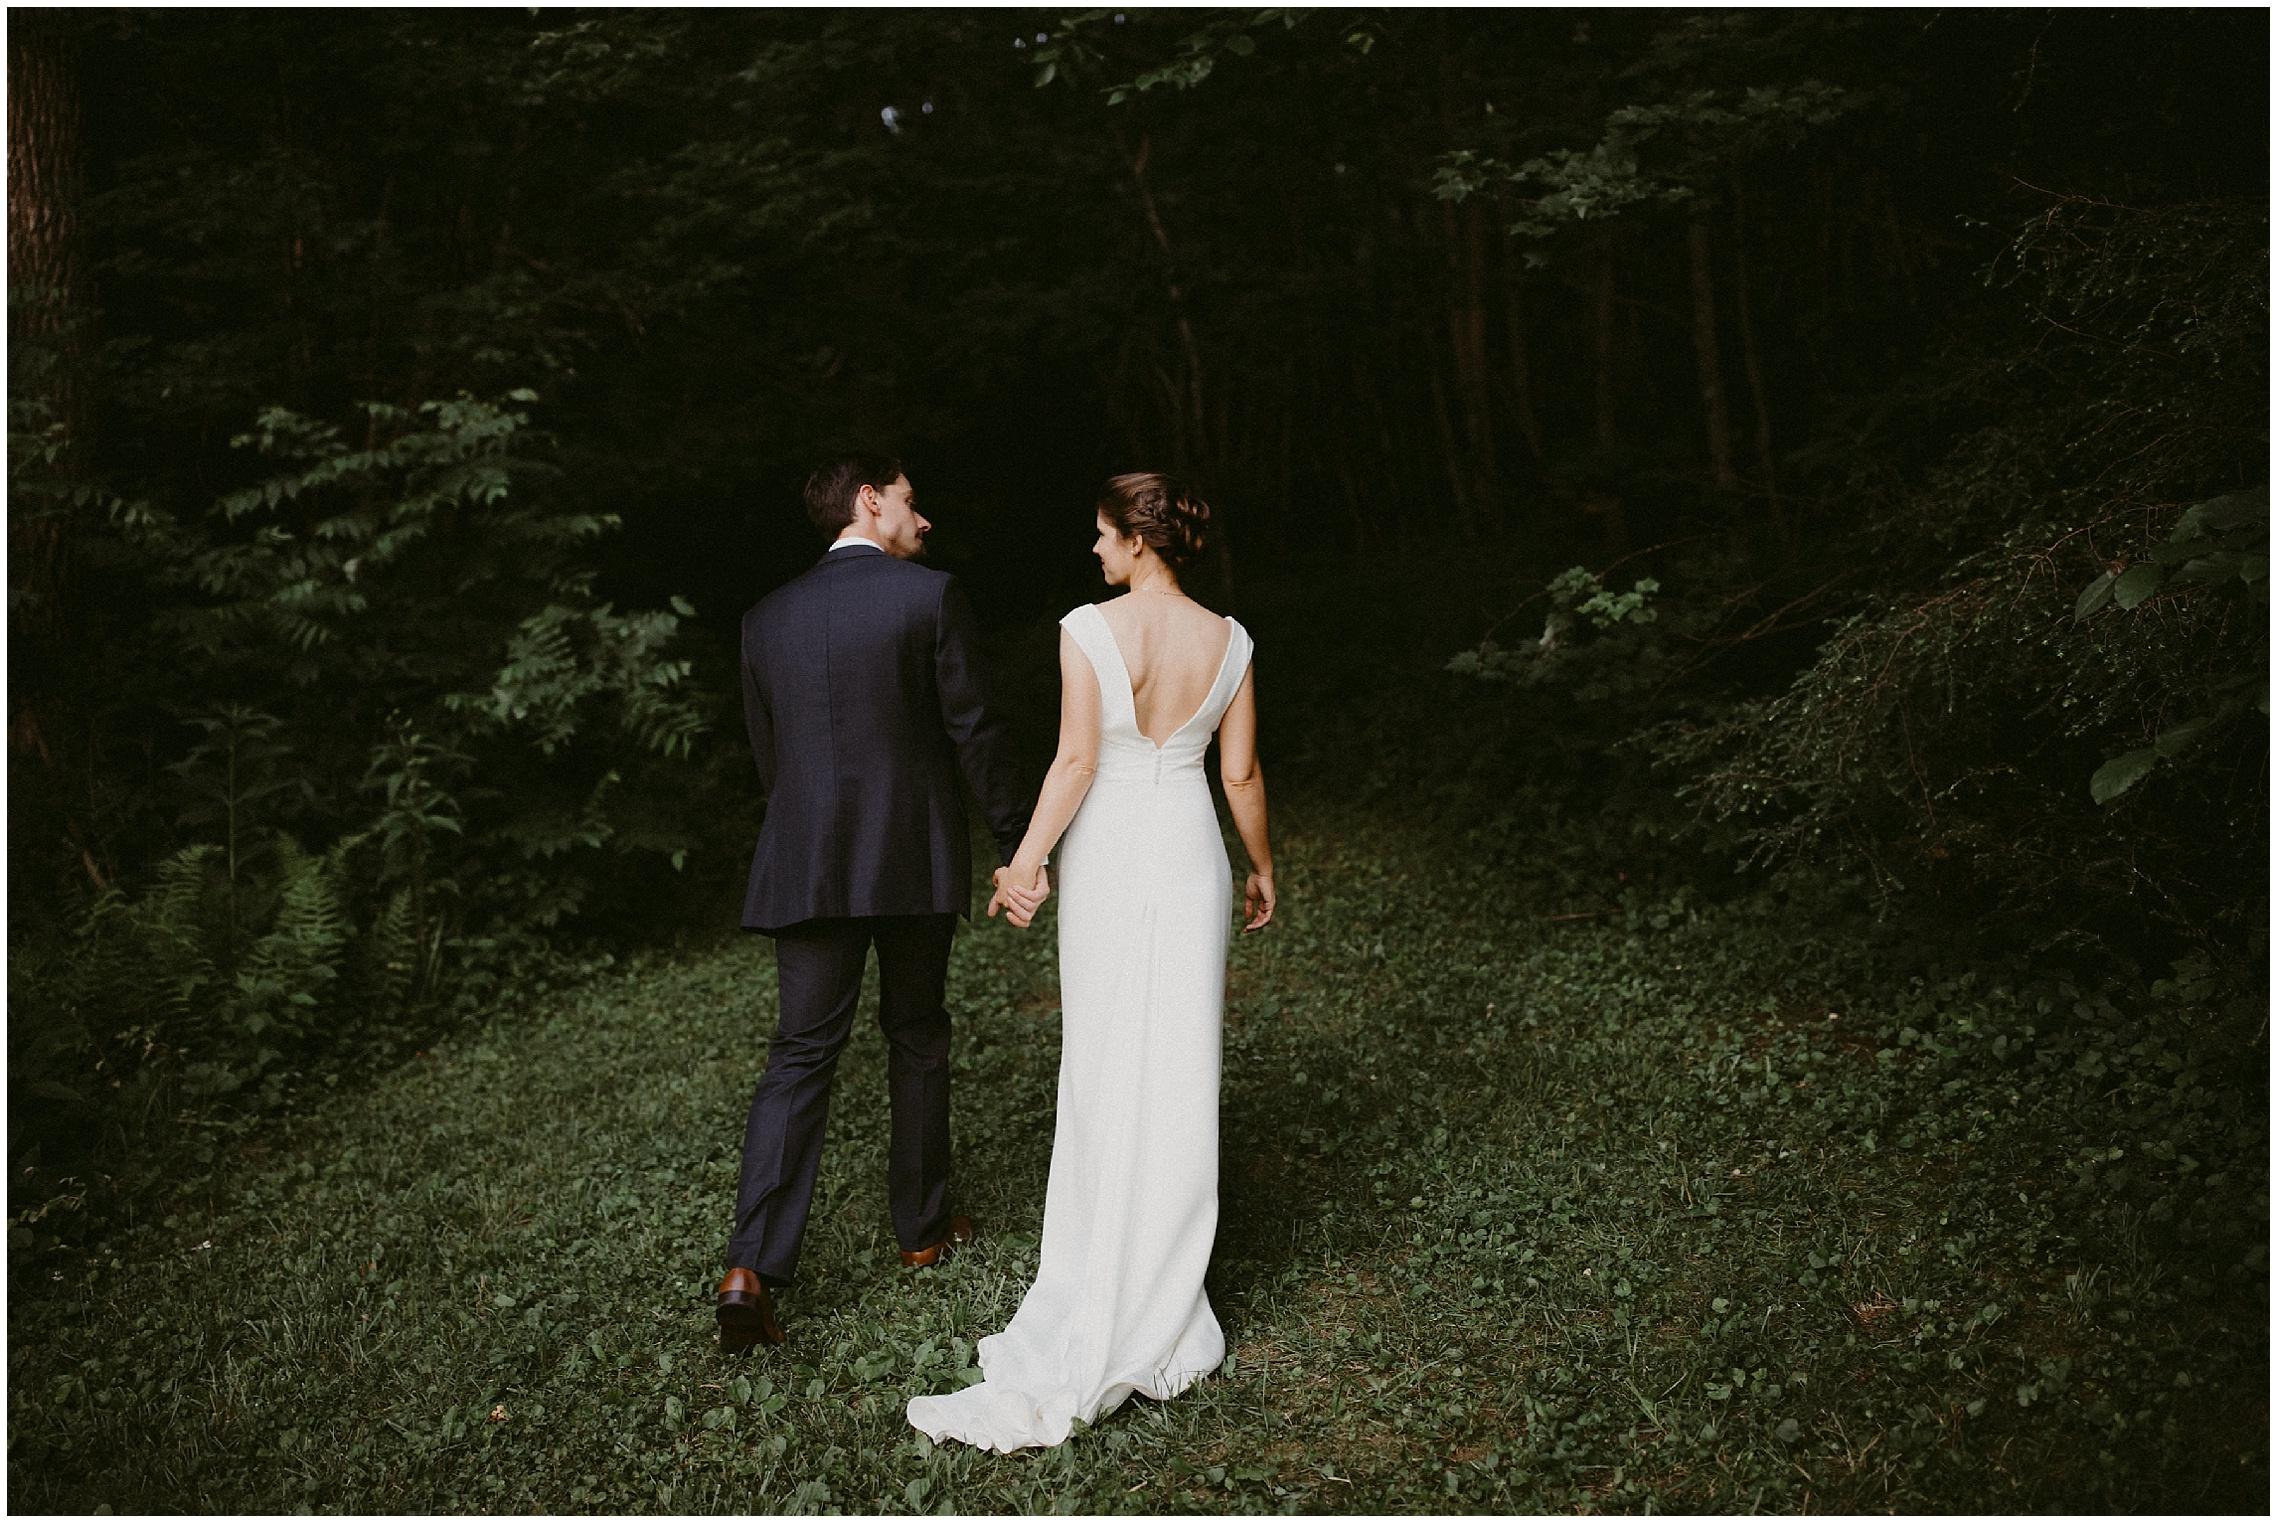 rock_creek_gardens_washington_wedding_photographer_0352.jpg